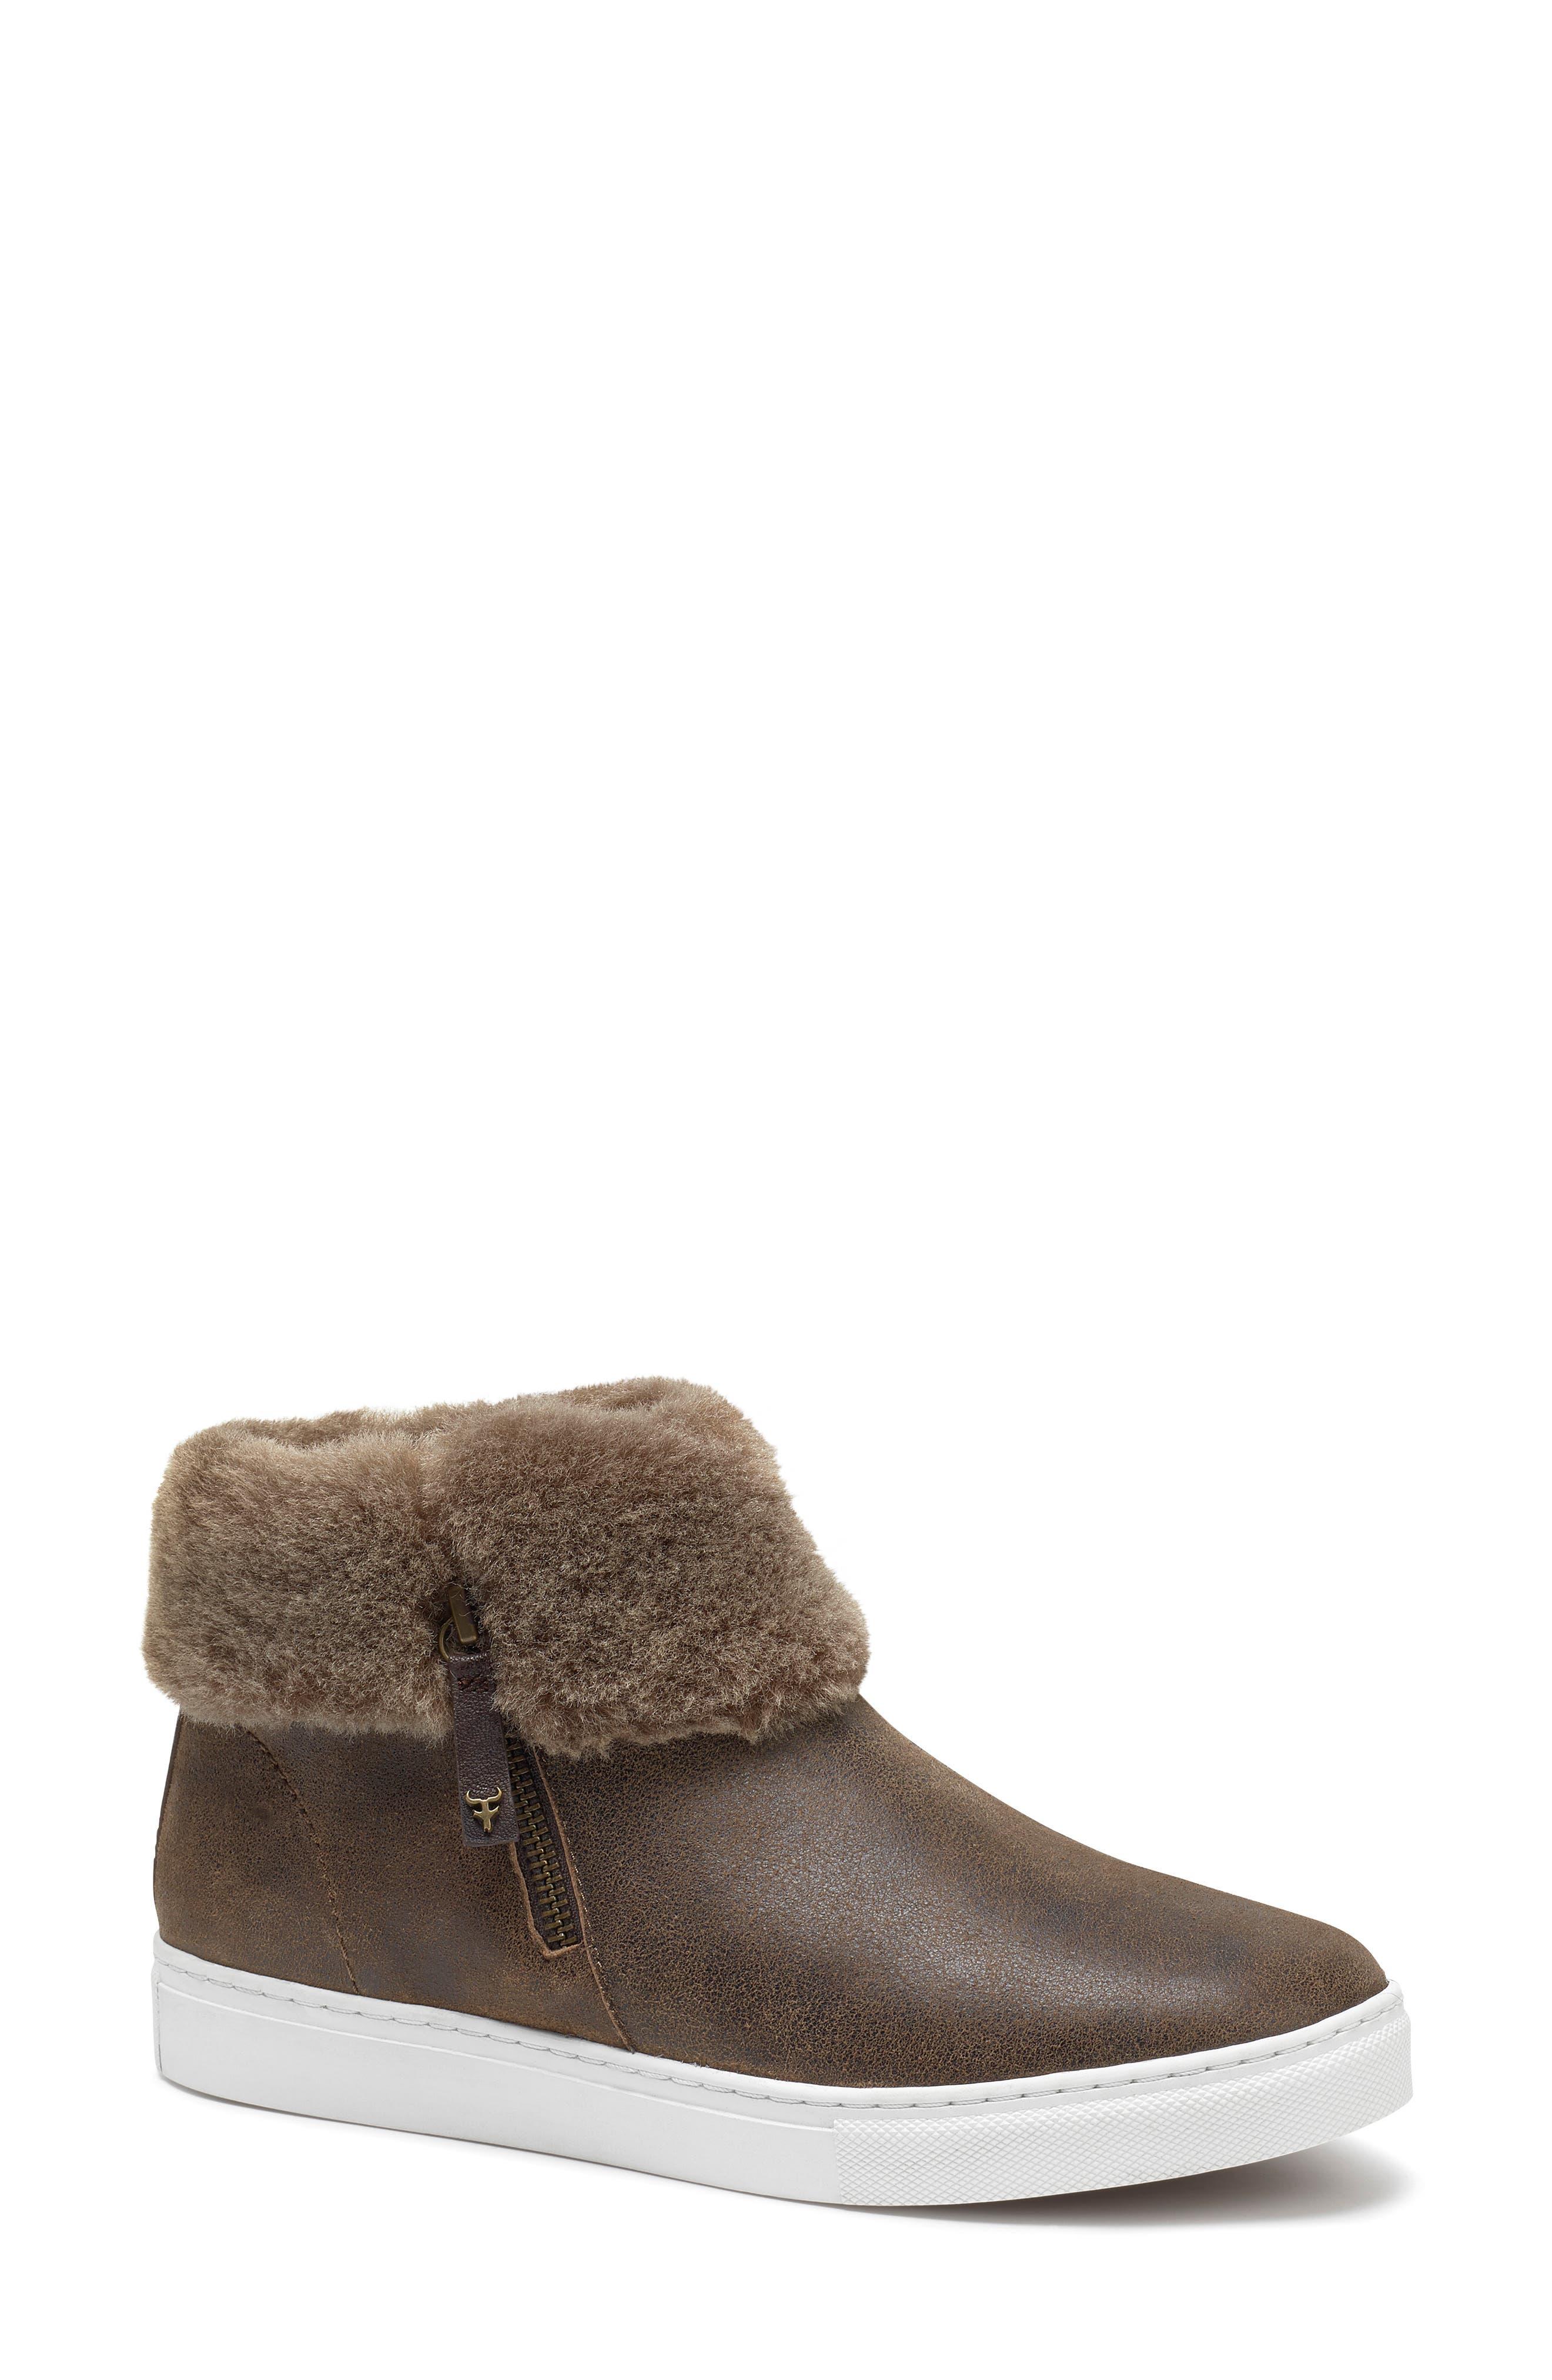 Trask Lexi Genuine Shearling Sneaker- Brown